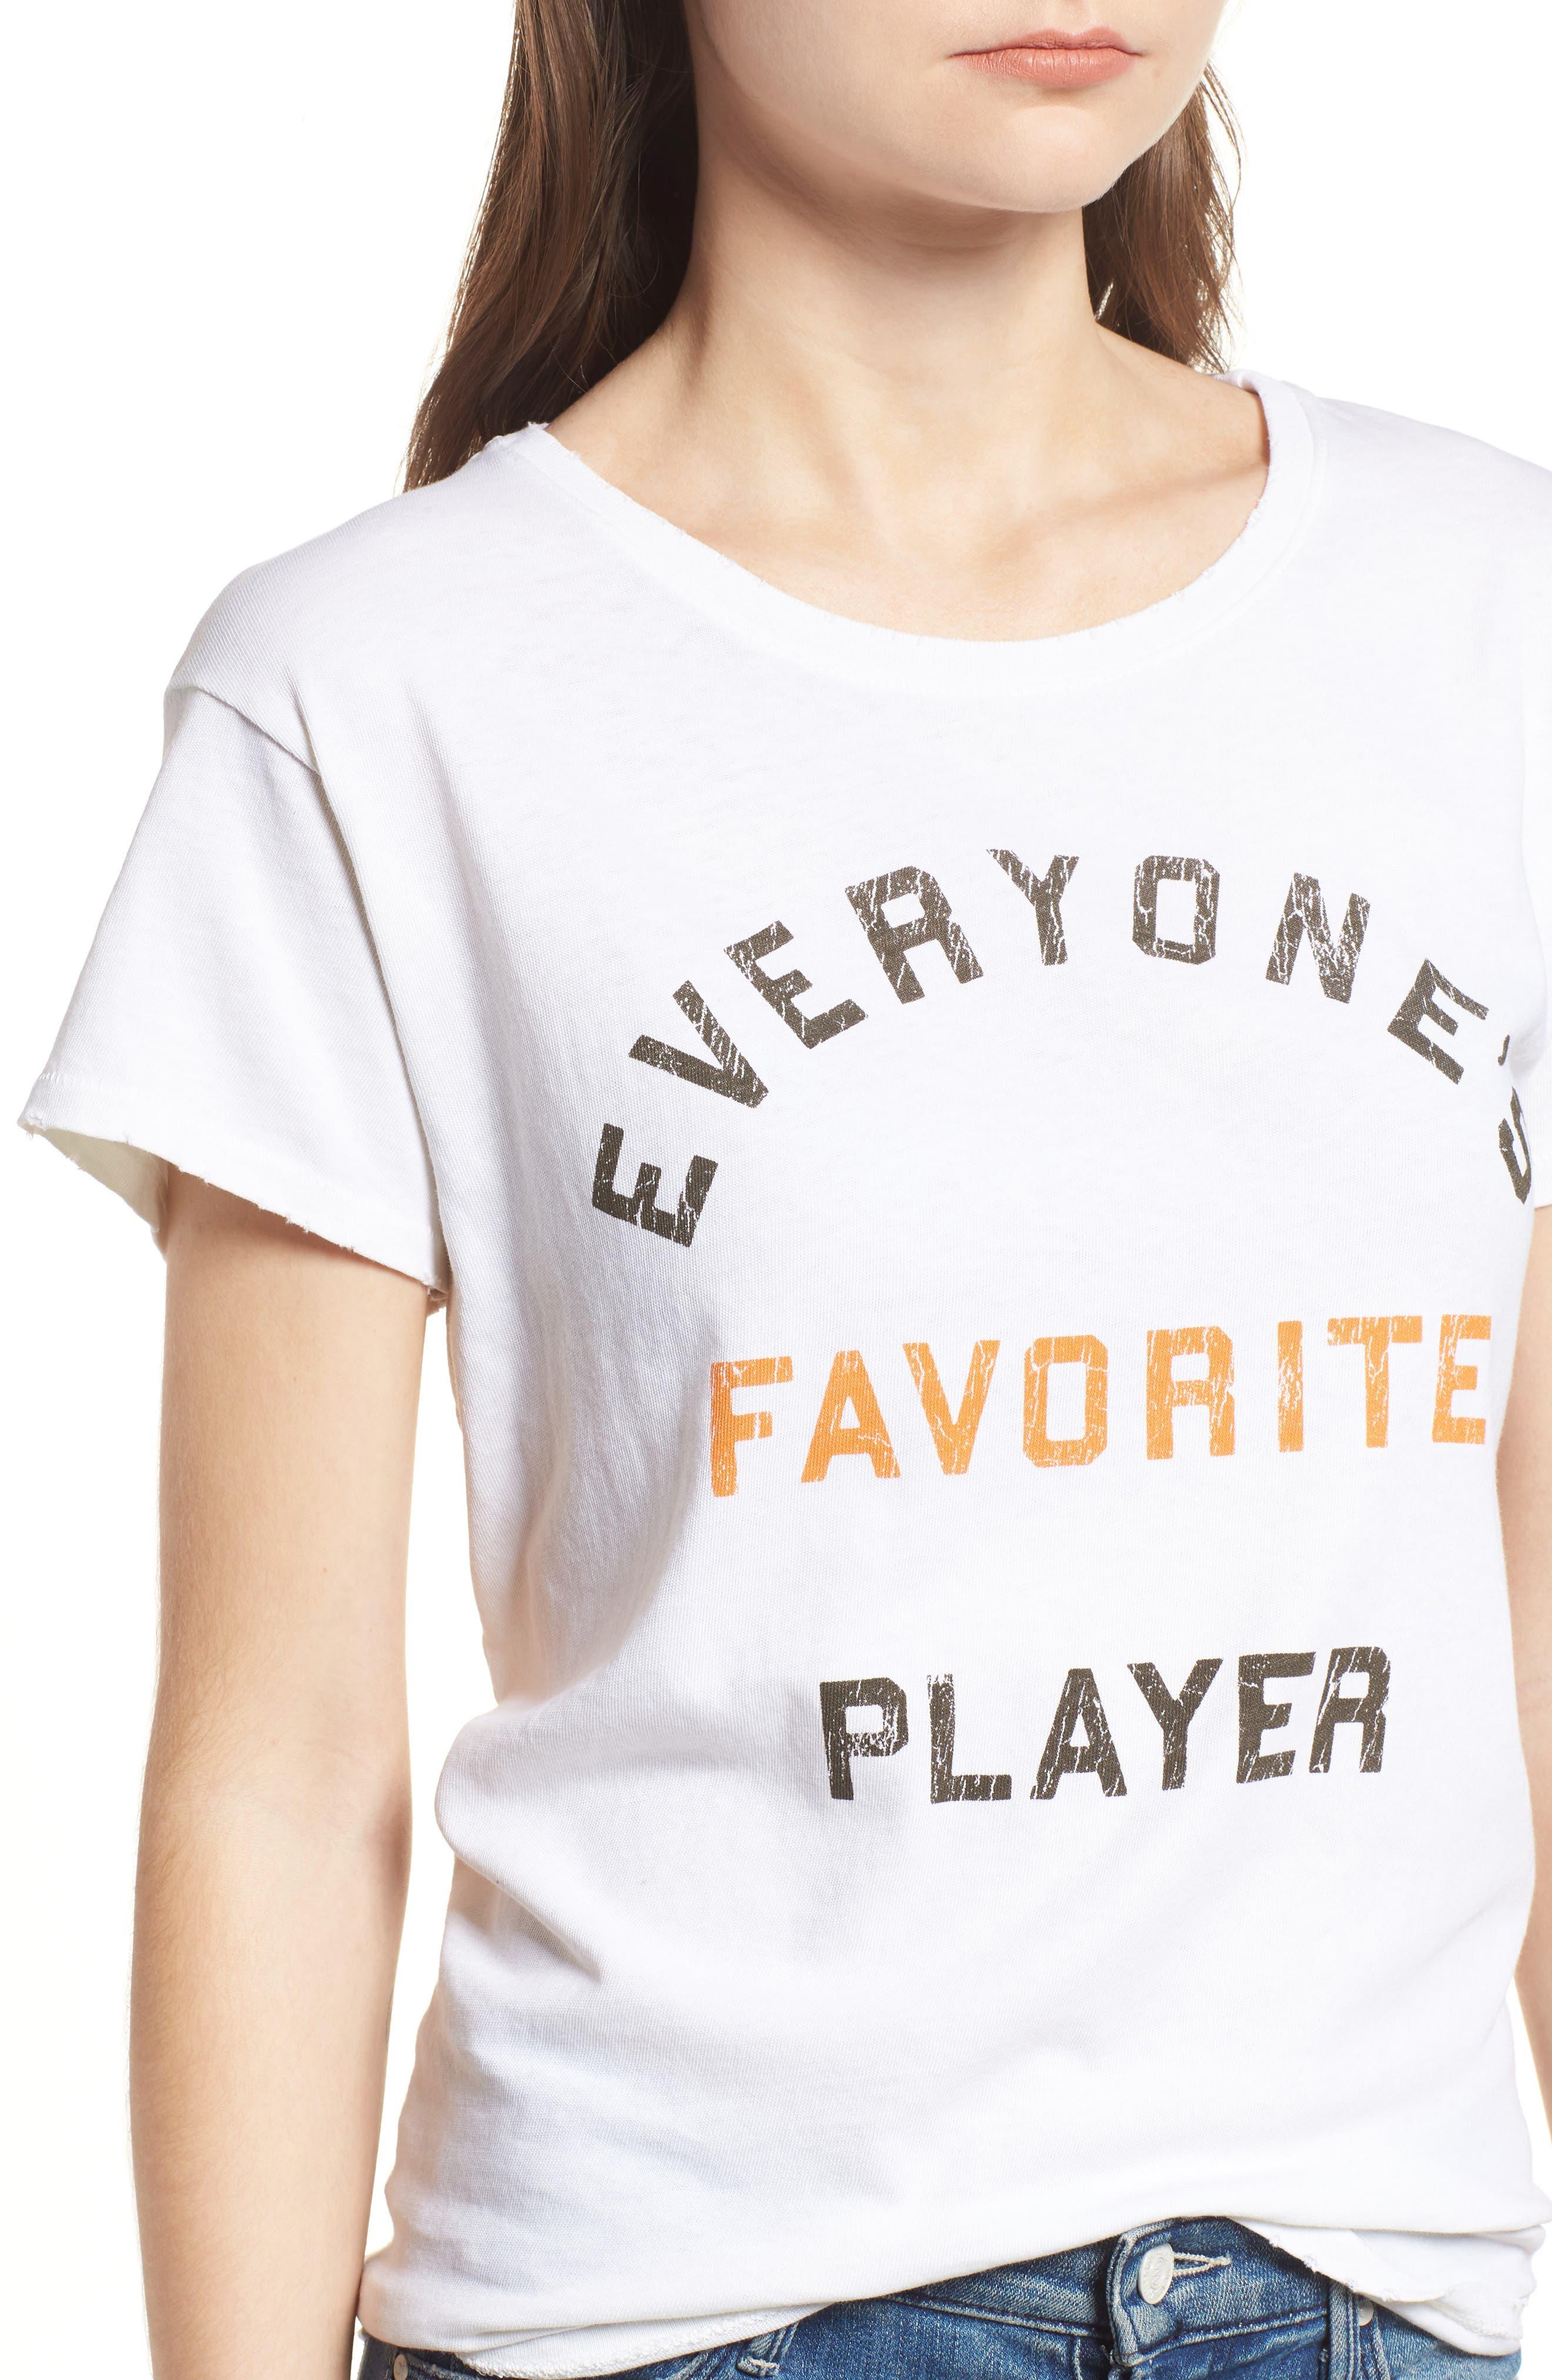 Everyone's Favorite Player Tee,                             Alternate thumbnail 4, color,                             VINTAGE WHITE ORANGE BLACK